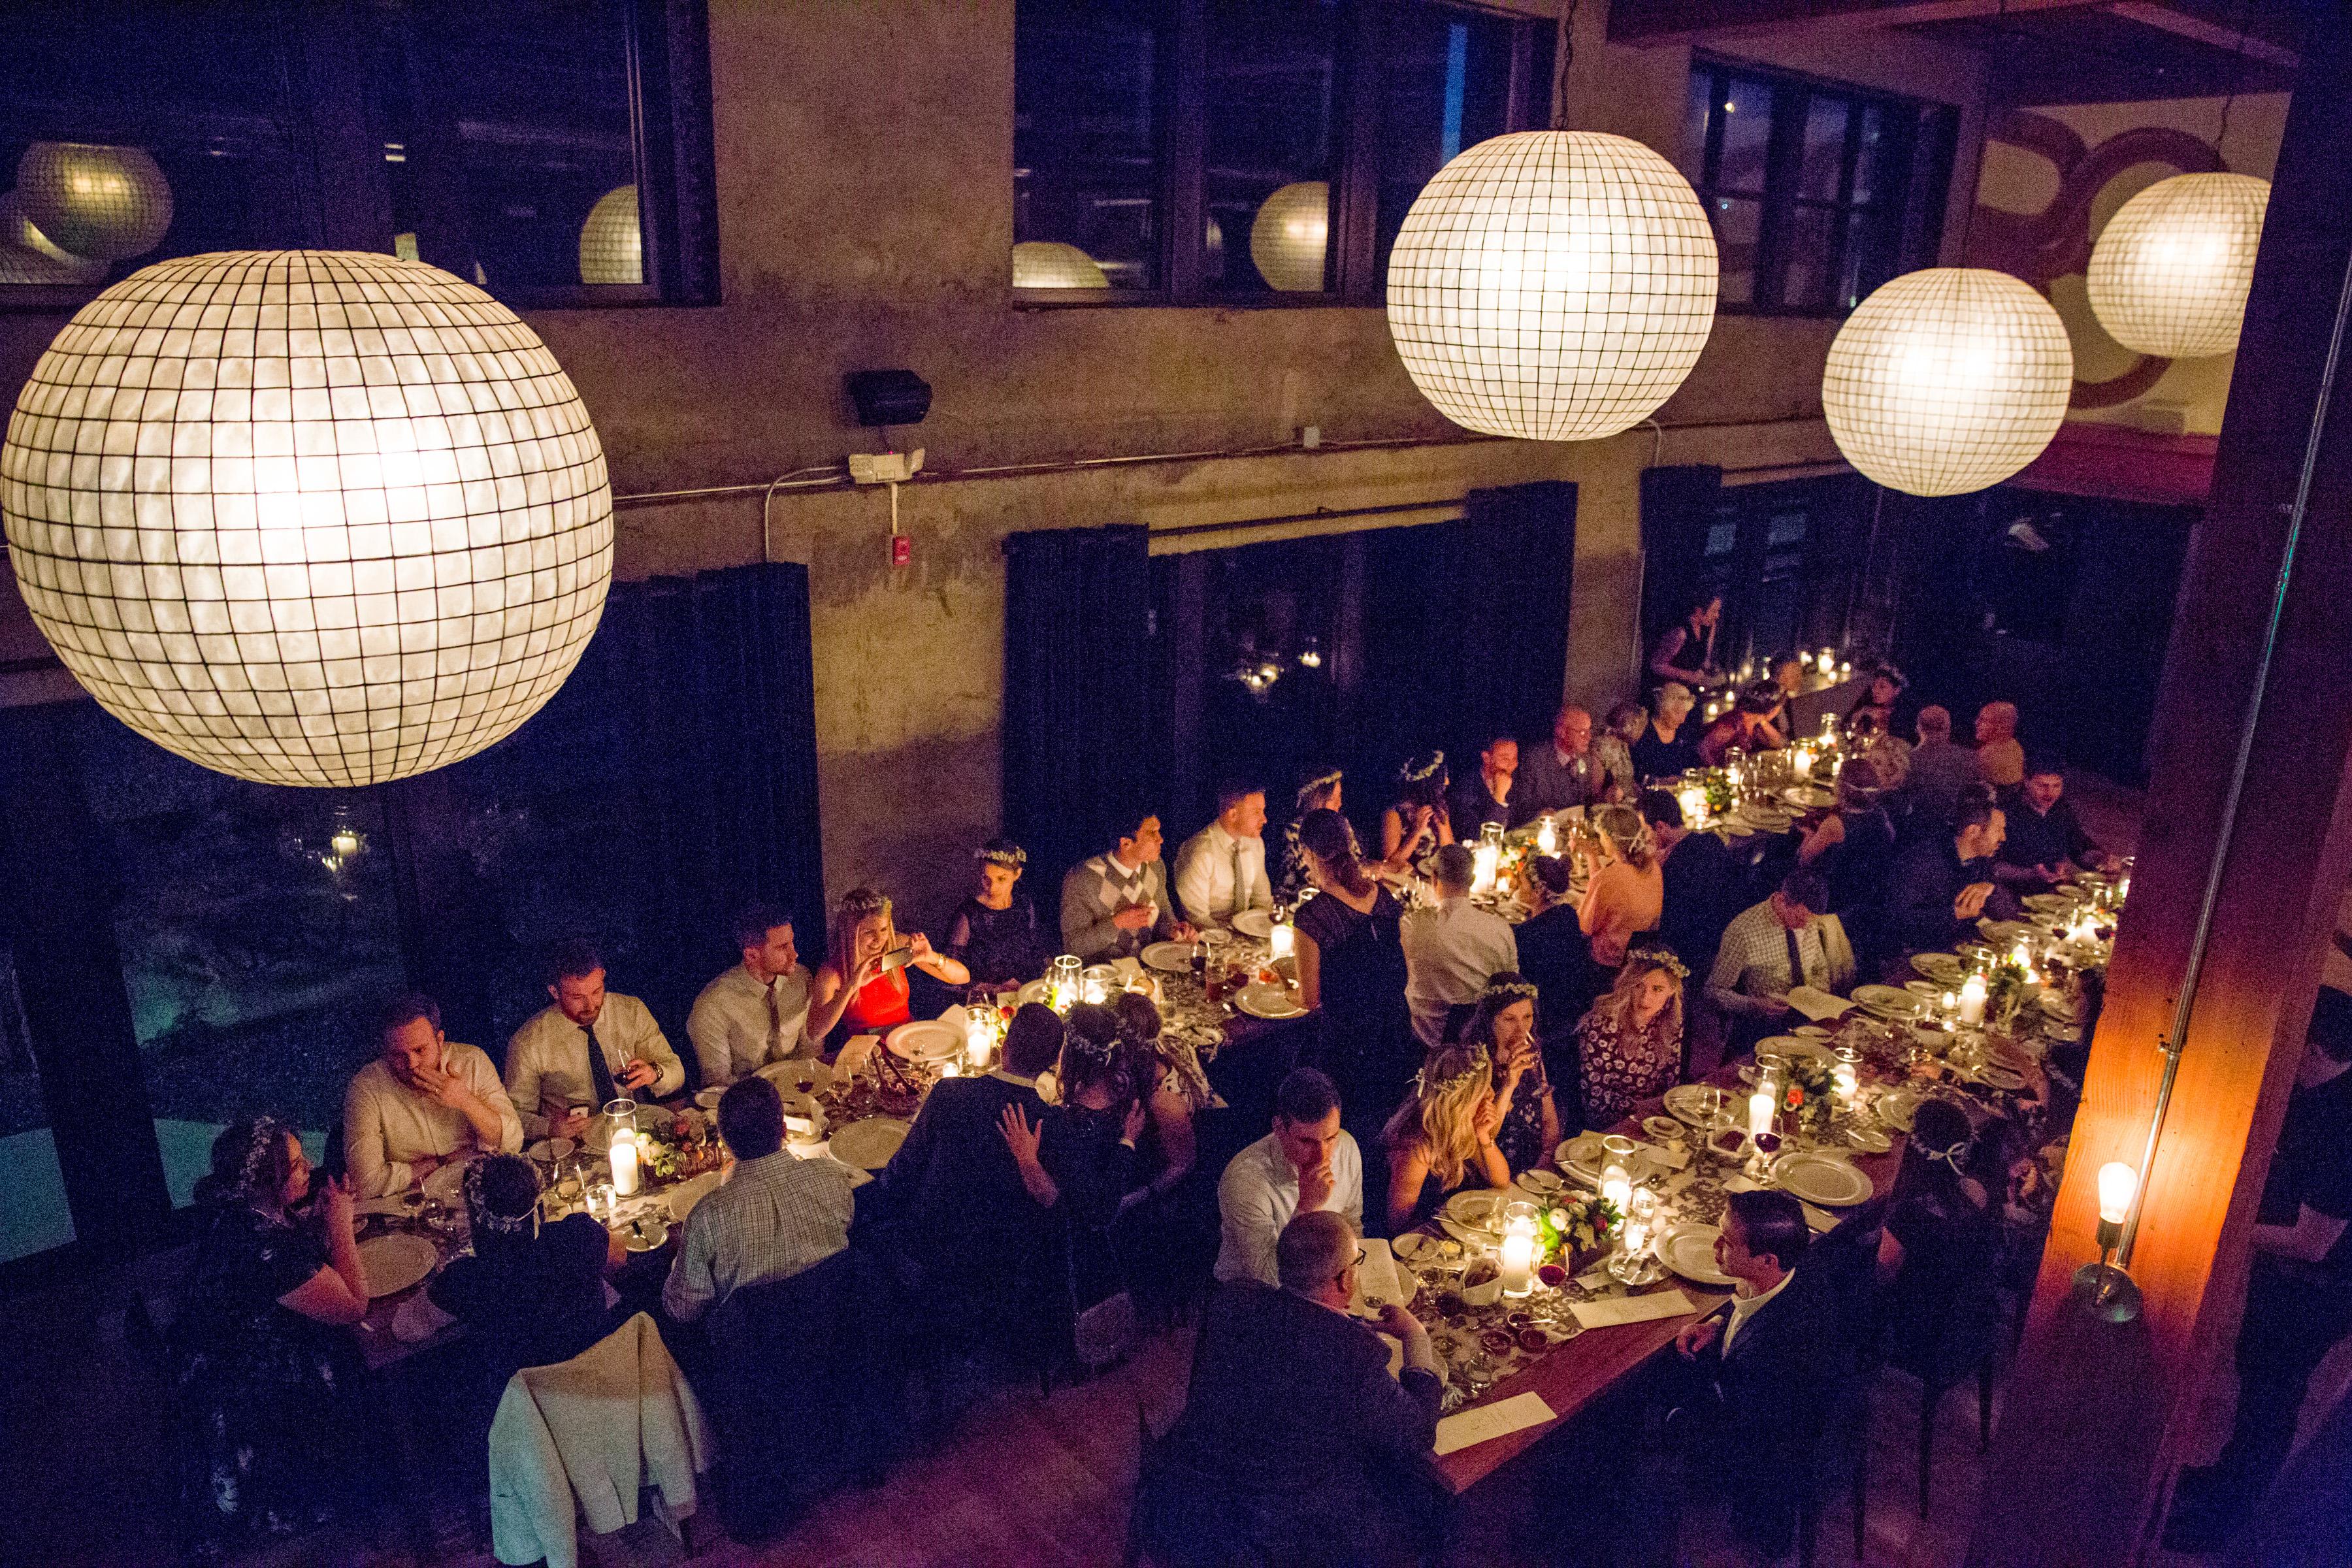 plaza-del-toro-weddings-012